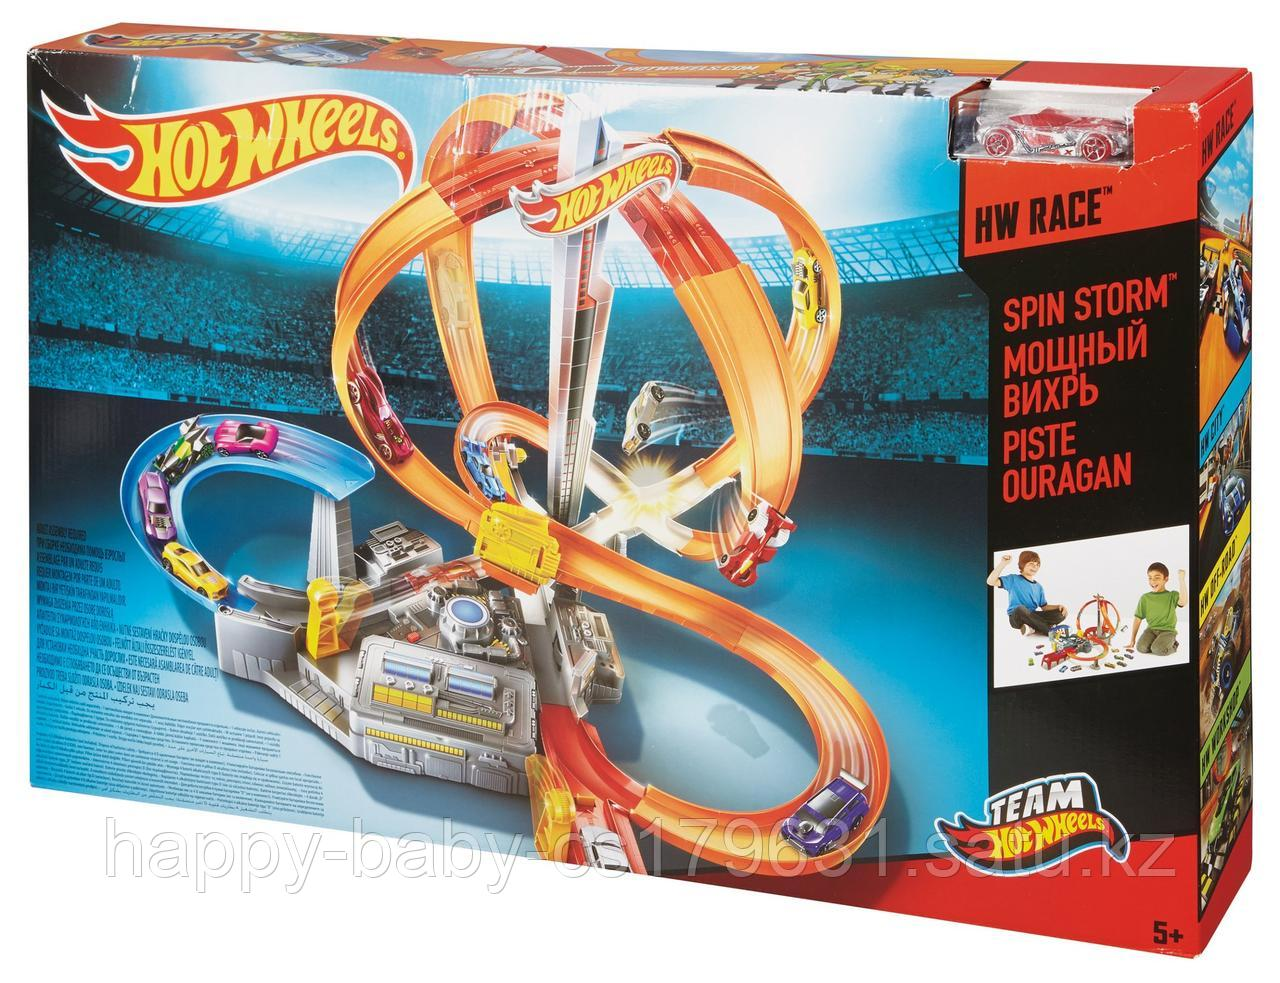 Hot wheels Spin Storm Хот Вилс игровой набор Мощный вихрь.